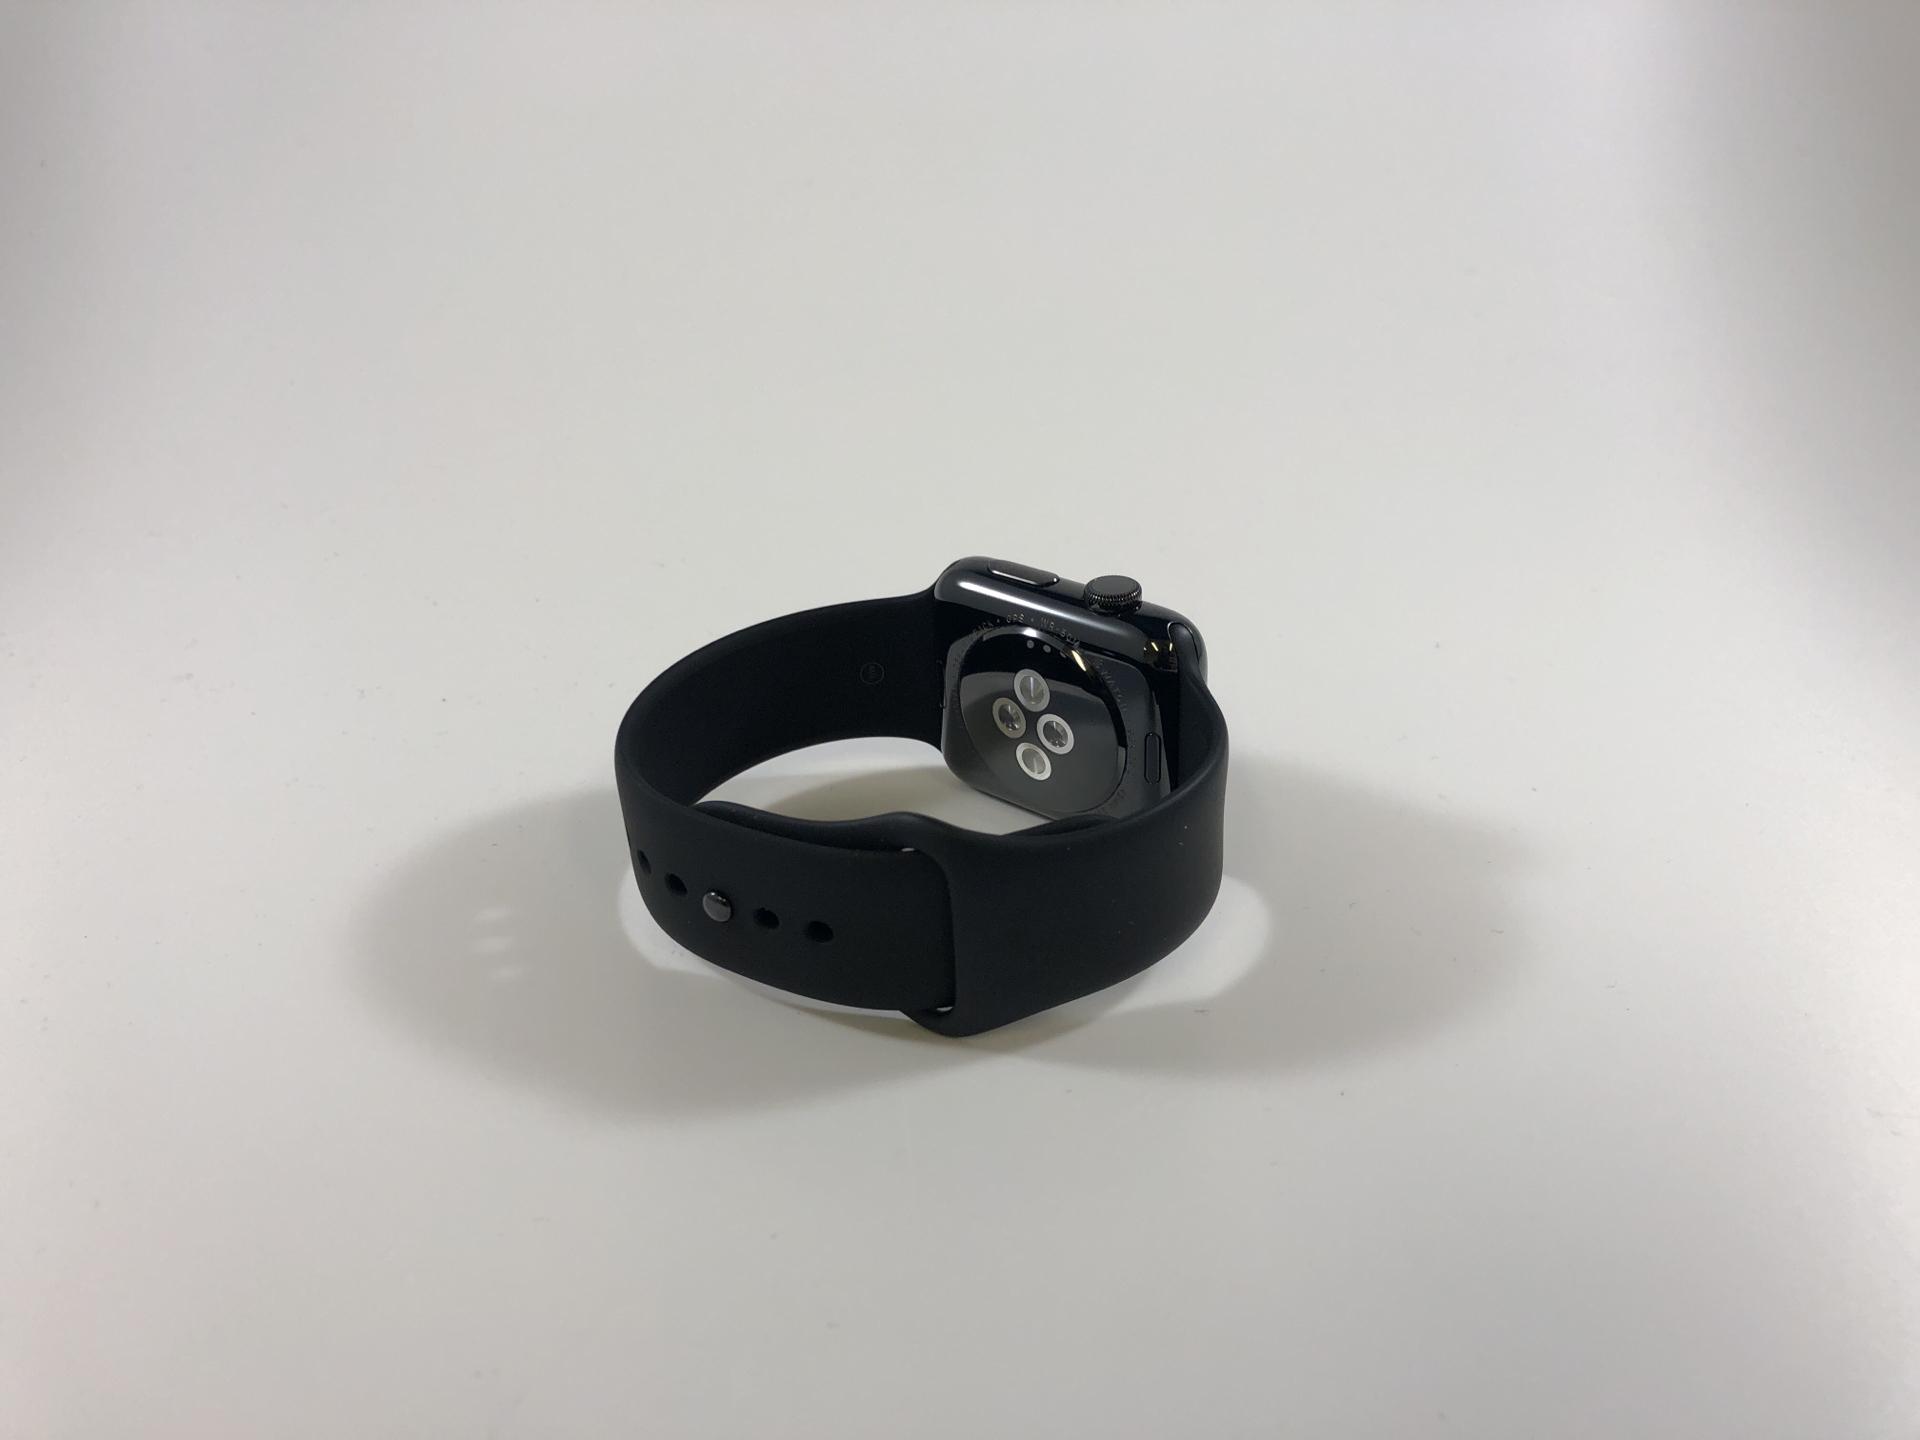 Watch Series 2 Steel (42mm), Space Black Stainless Steel, Black Sport Band, bild 3